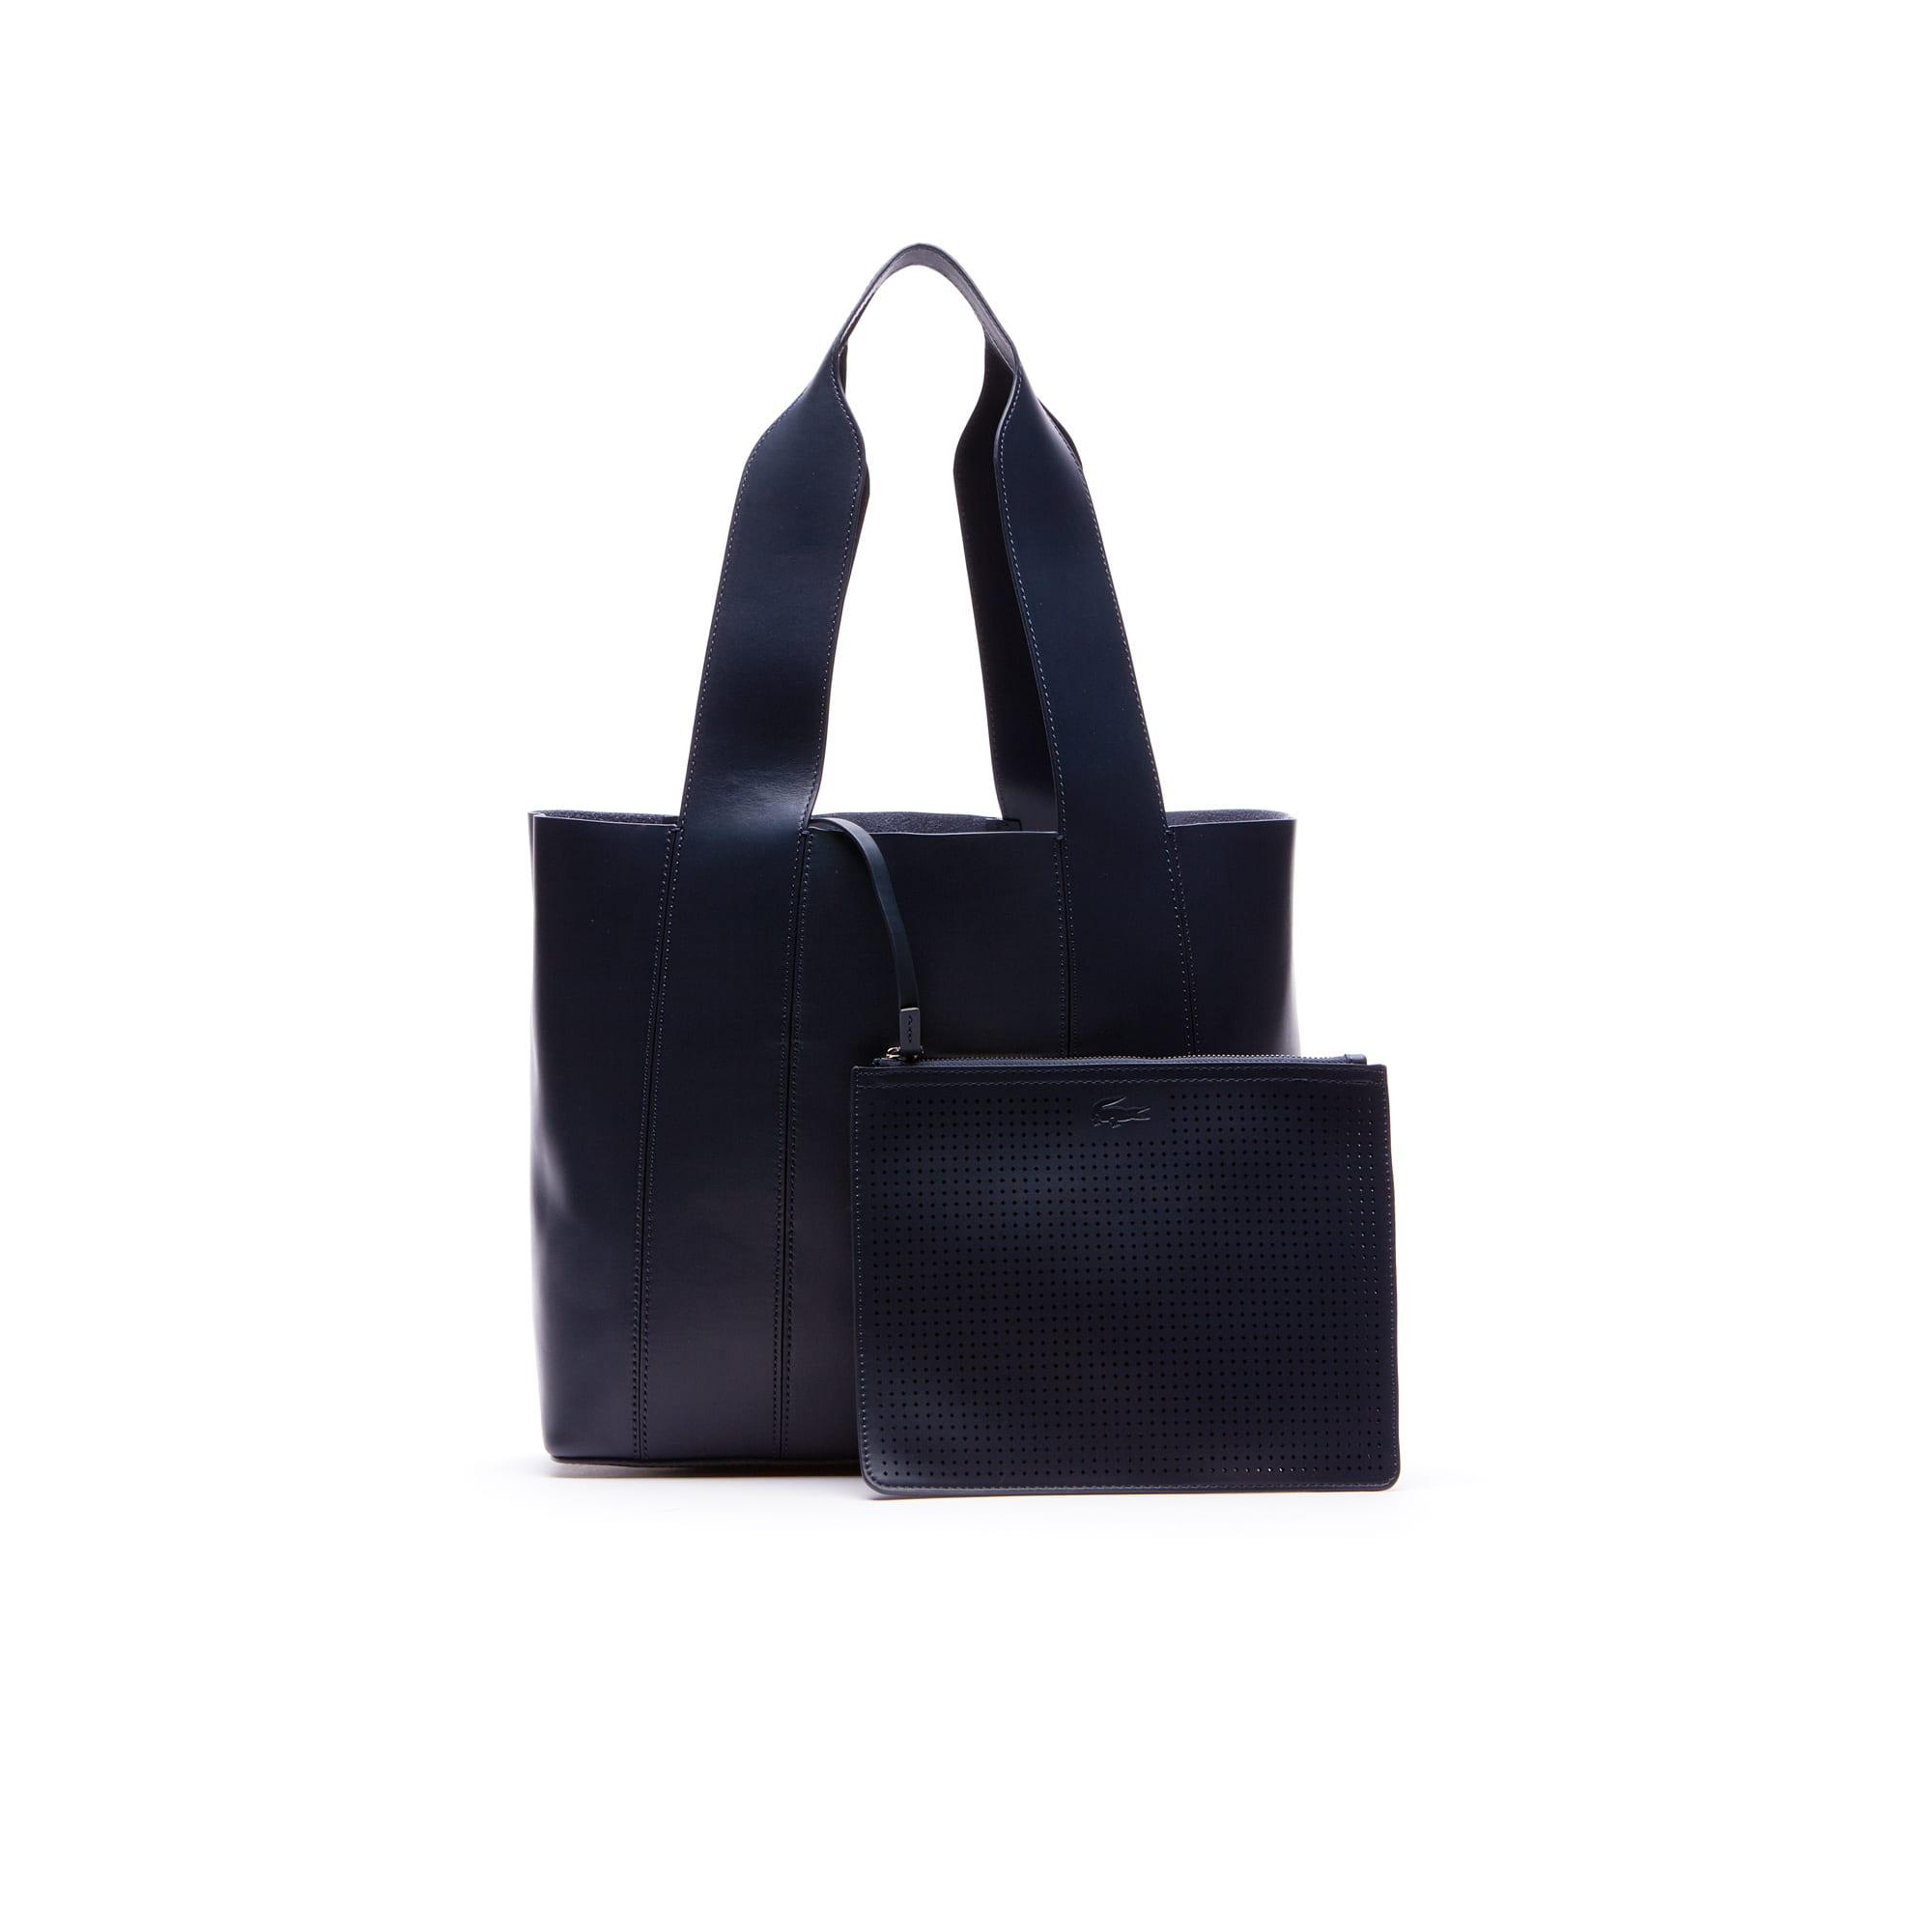 ... Women\u0027s Purity Soft Monochrome Leather Tote Bag